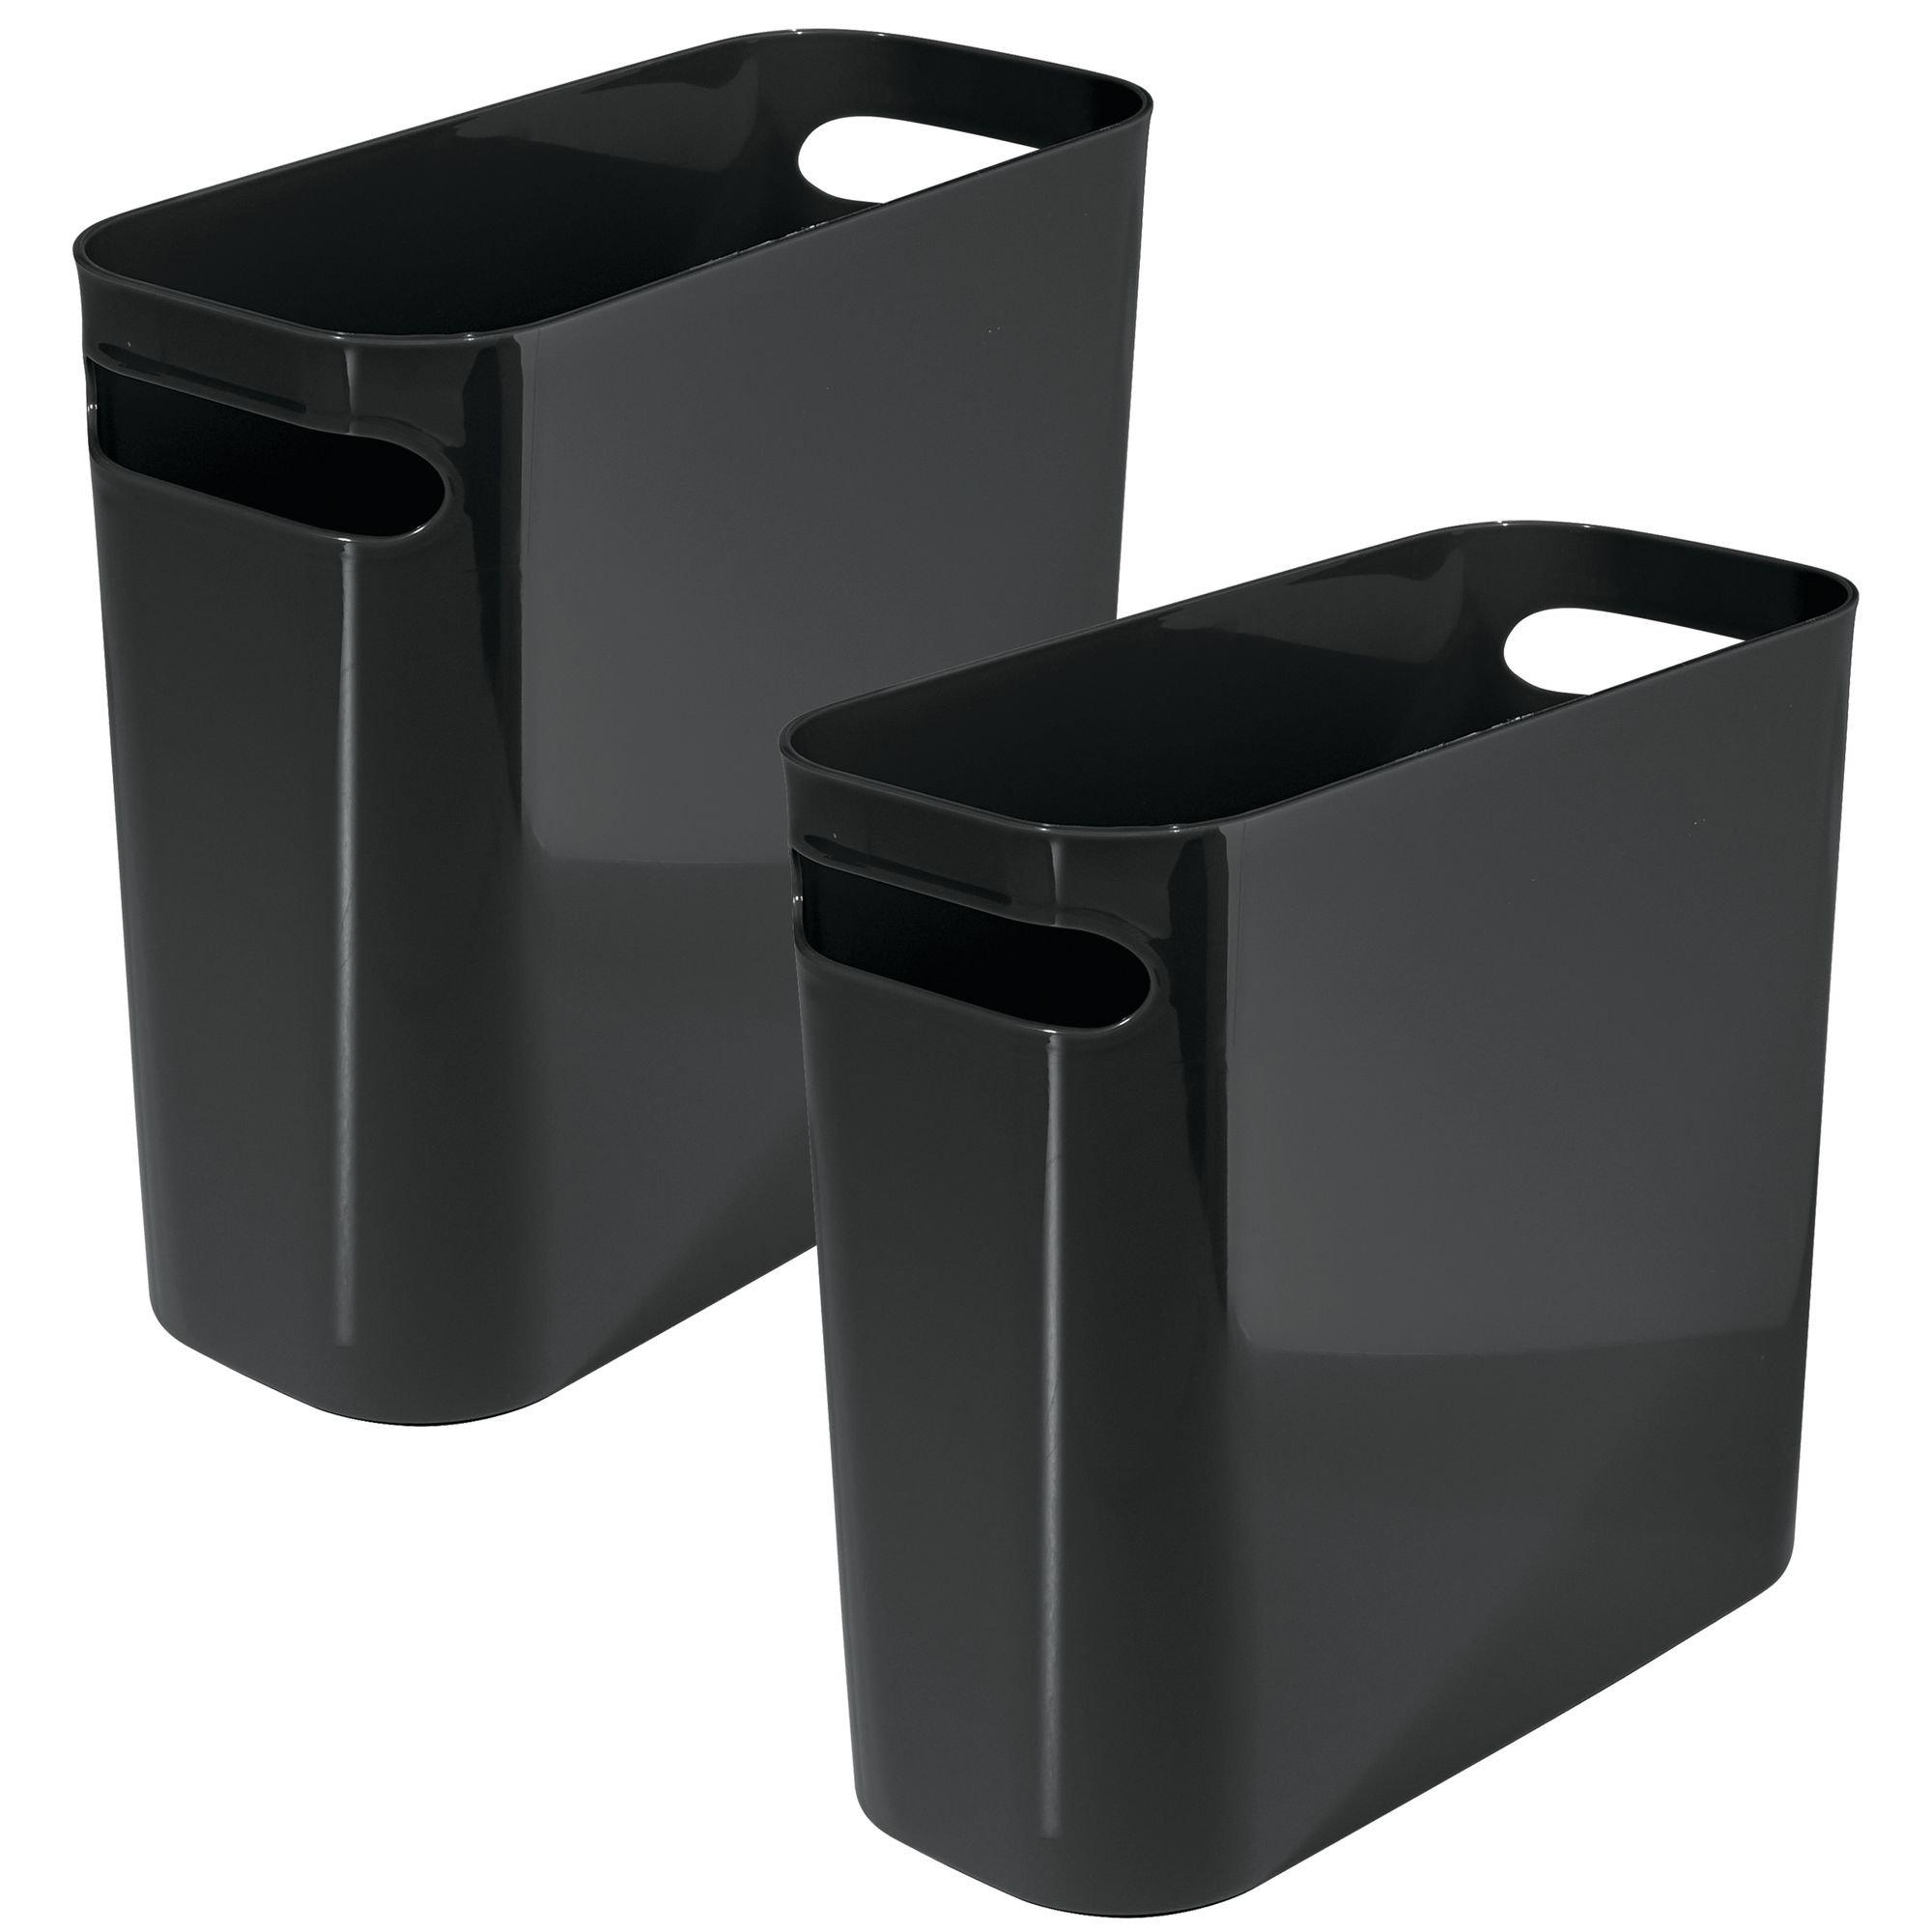 mDesign Slim Plastic Rectangular Small Trash Can Wastebasket, Garbage Container Bin with Handles for Bathroom, Kitchen, Home Office, Dorm, Kids Room - 10'' high, Shatter-Resistant, 2 Pack - Black